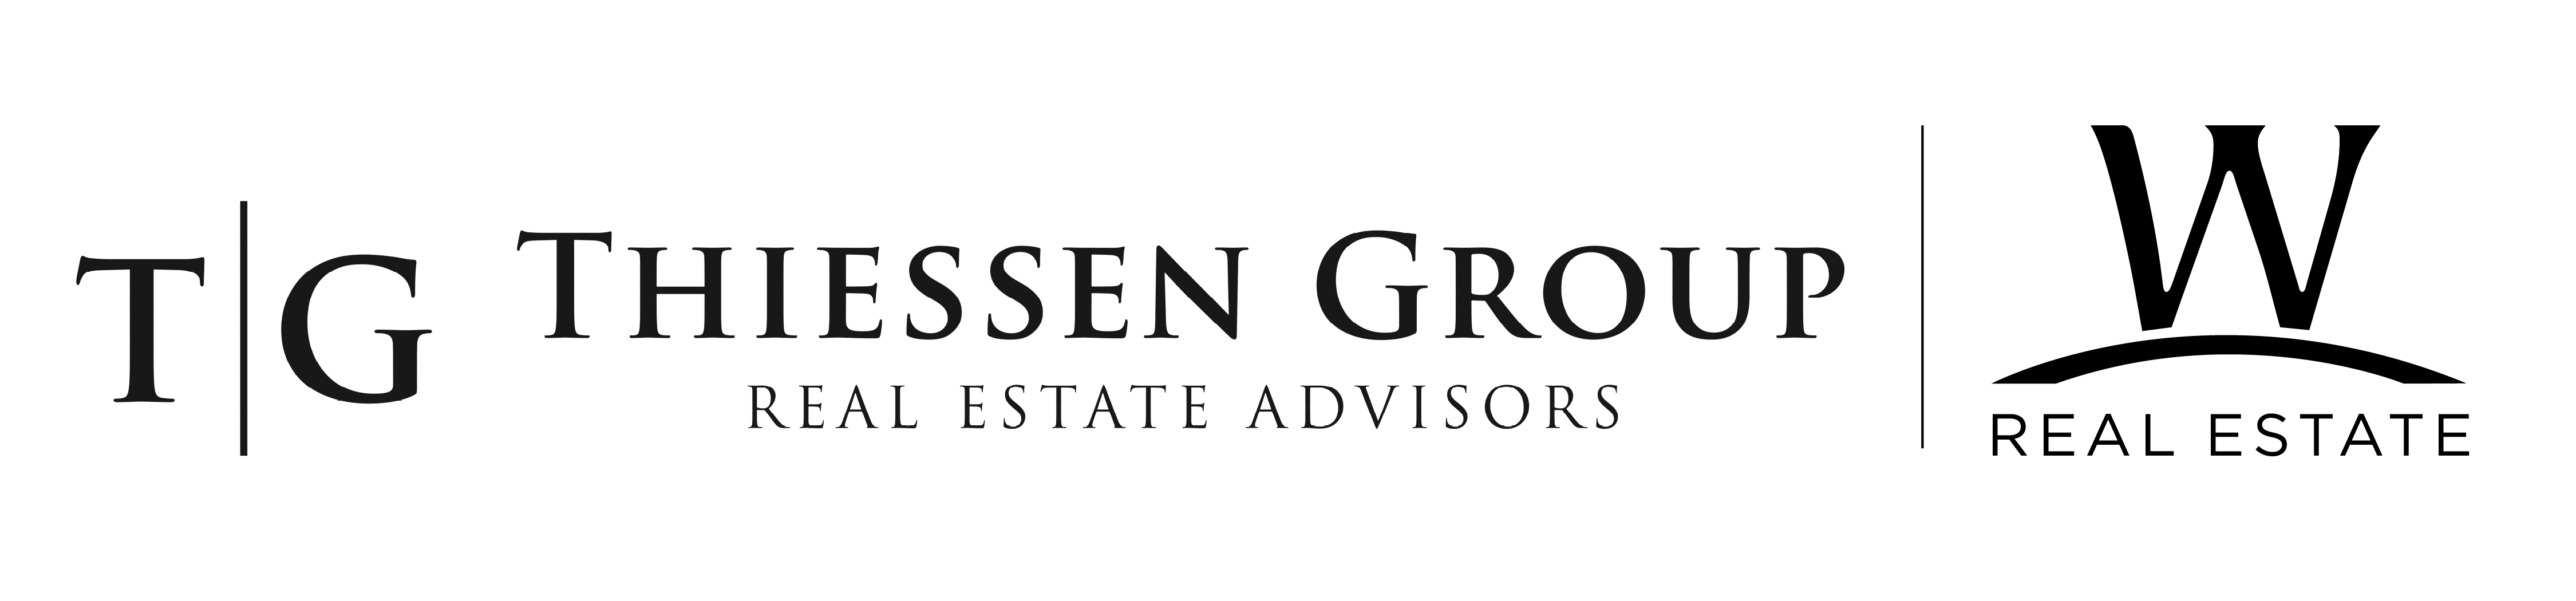 Thiessen Group